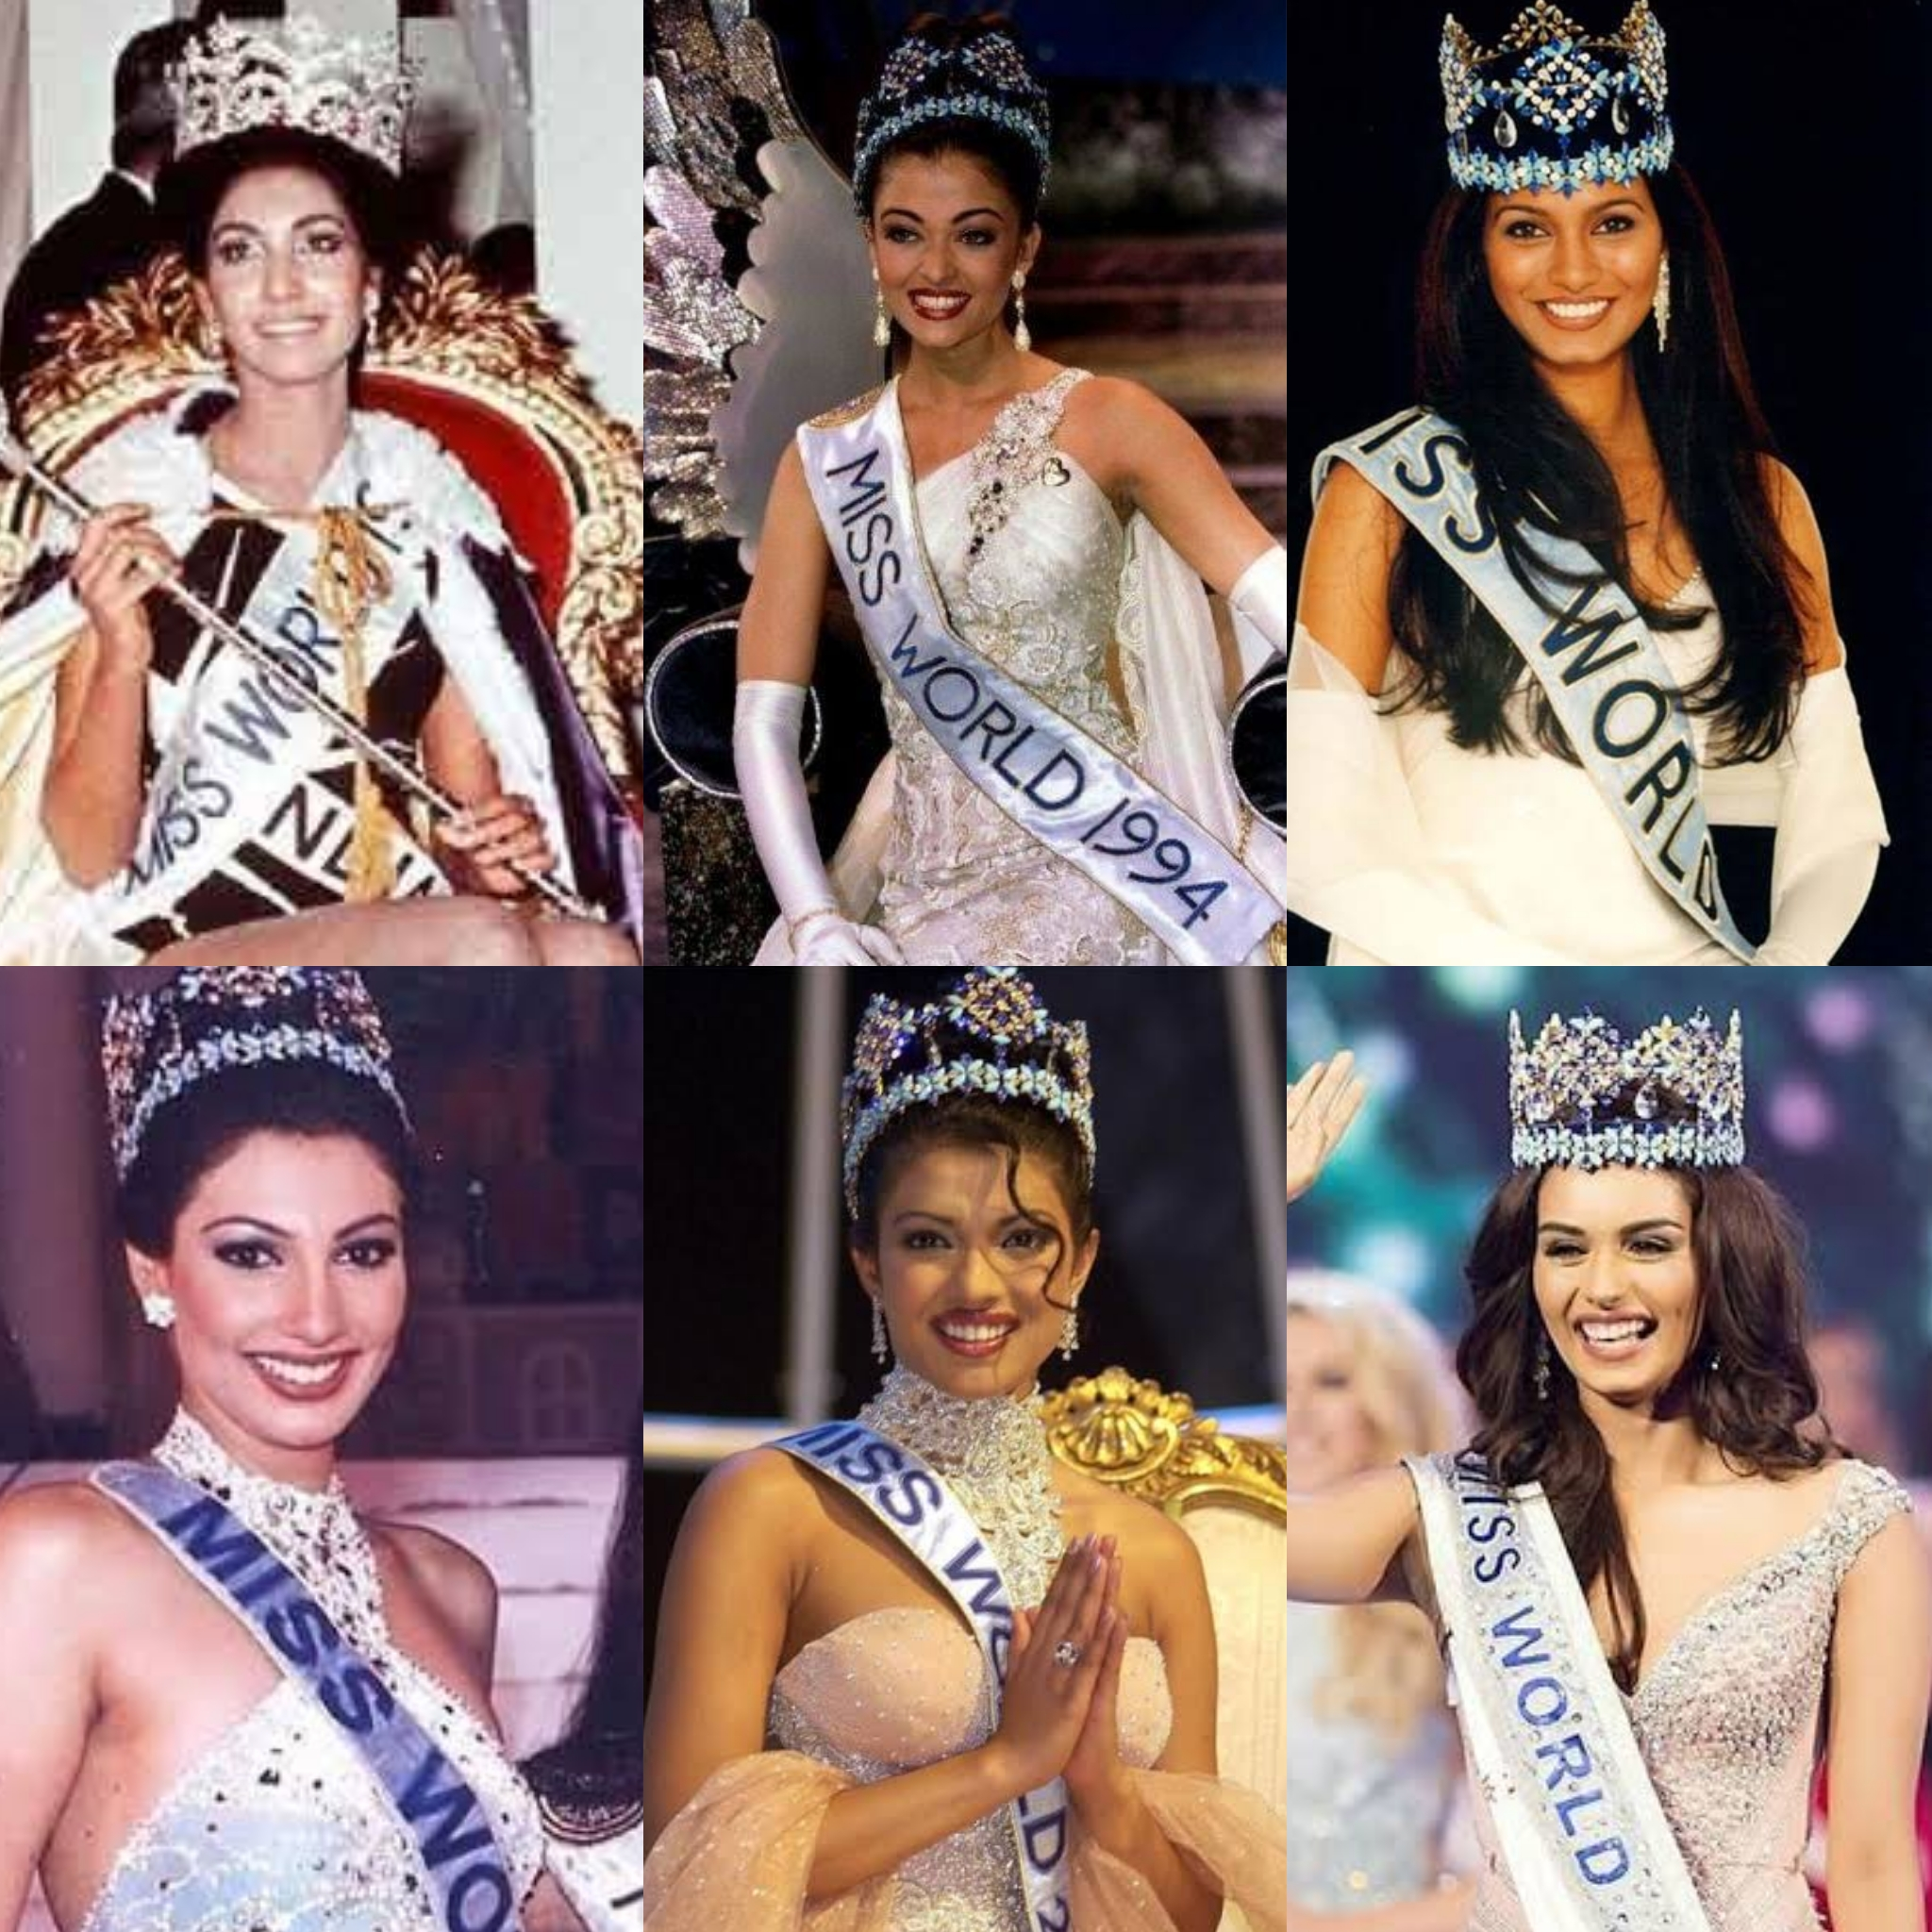 Reita-Faria-Miss-World-1966-Aishwarya-Rai-Miss-World-1994-Diana-Hayden-Miss-World-1997-Yukta-Mookhey-Miss-World-1999-Priyanka-Chopra-Miss-World-2000-Manushi-Chhillar-Miss-World-2017